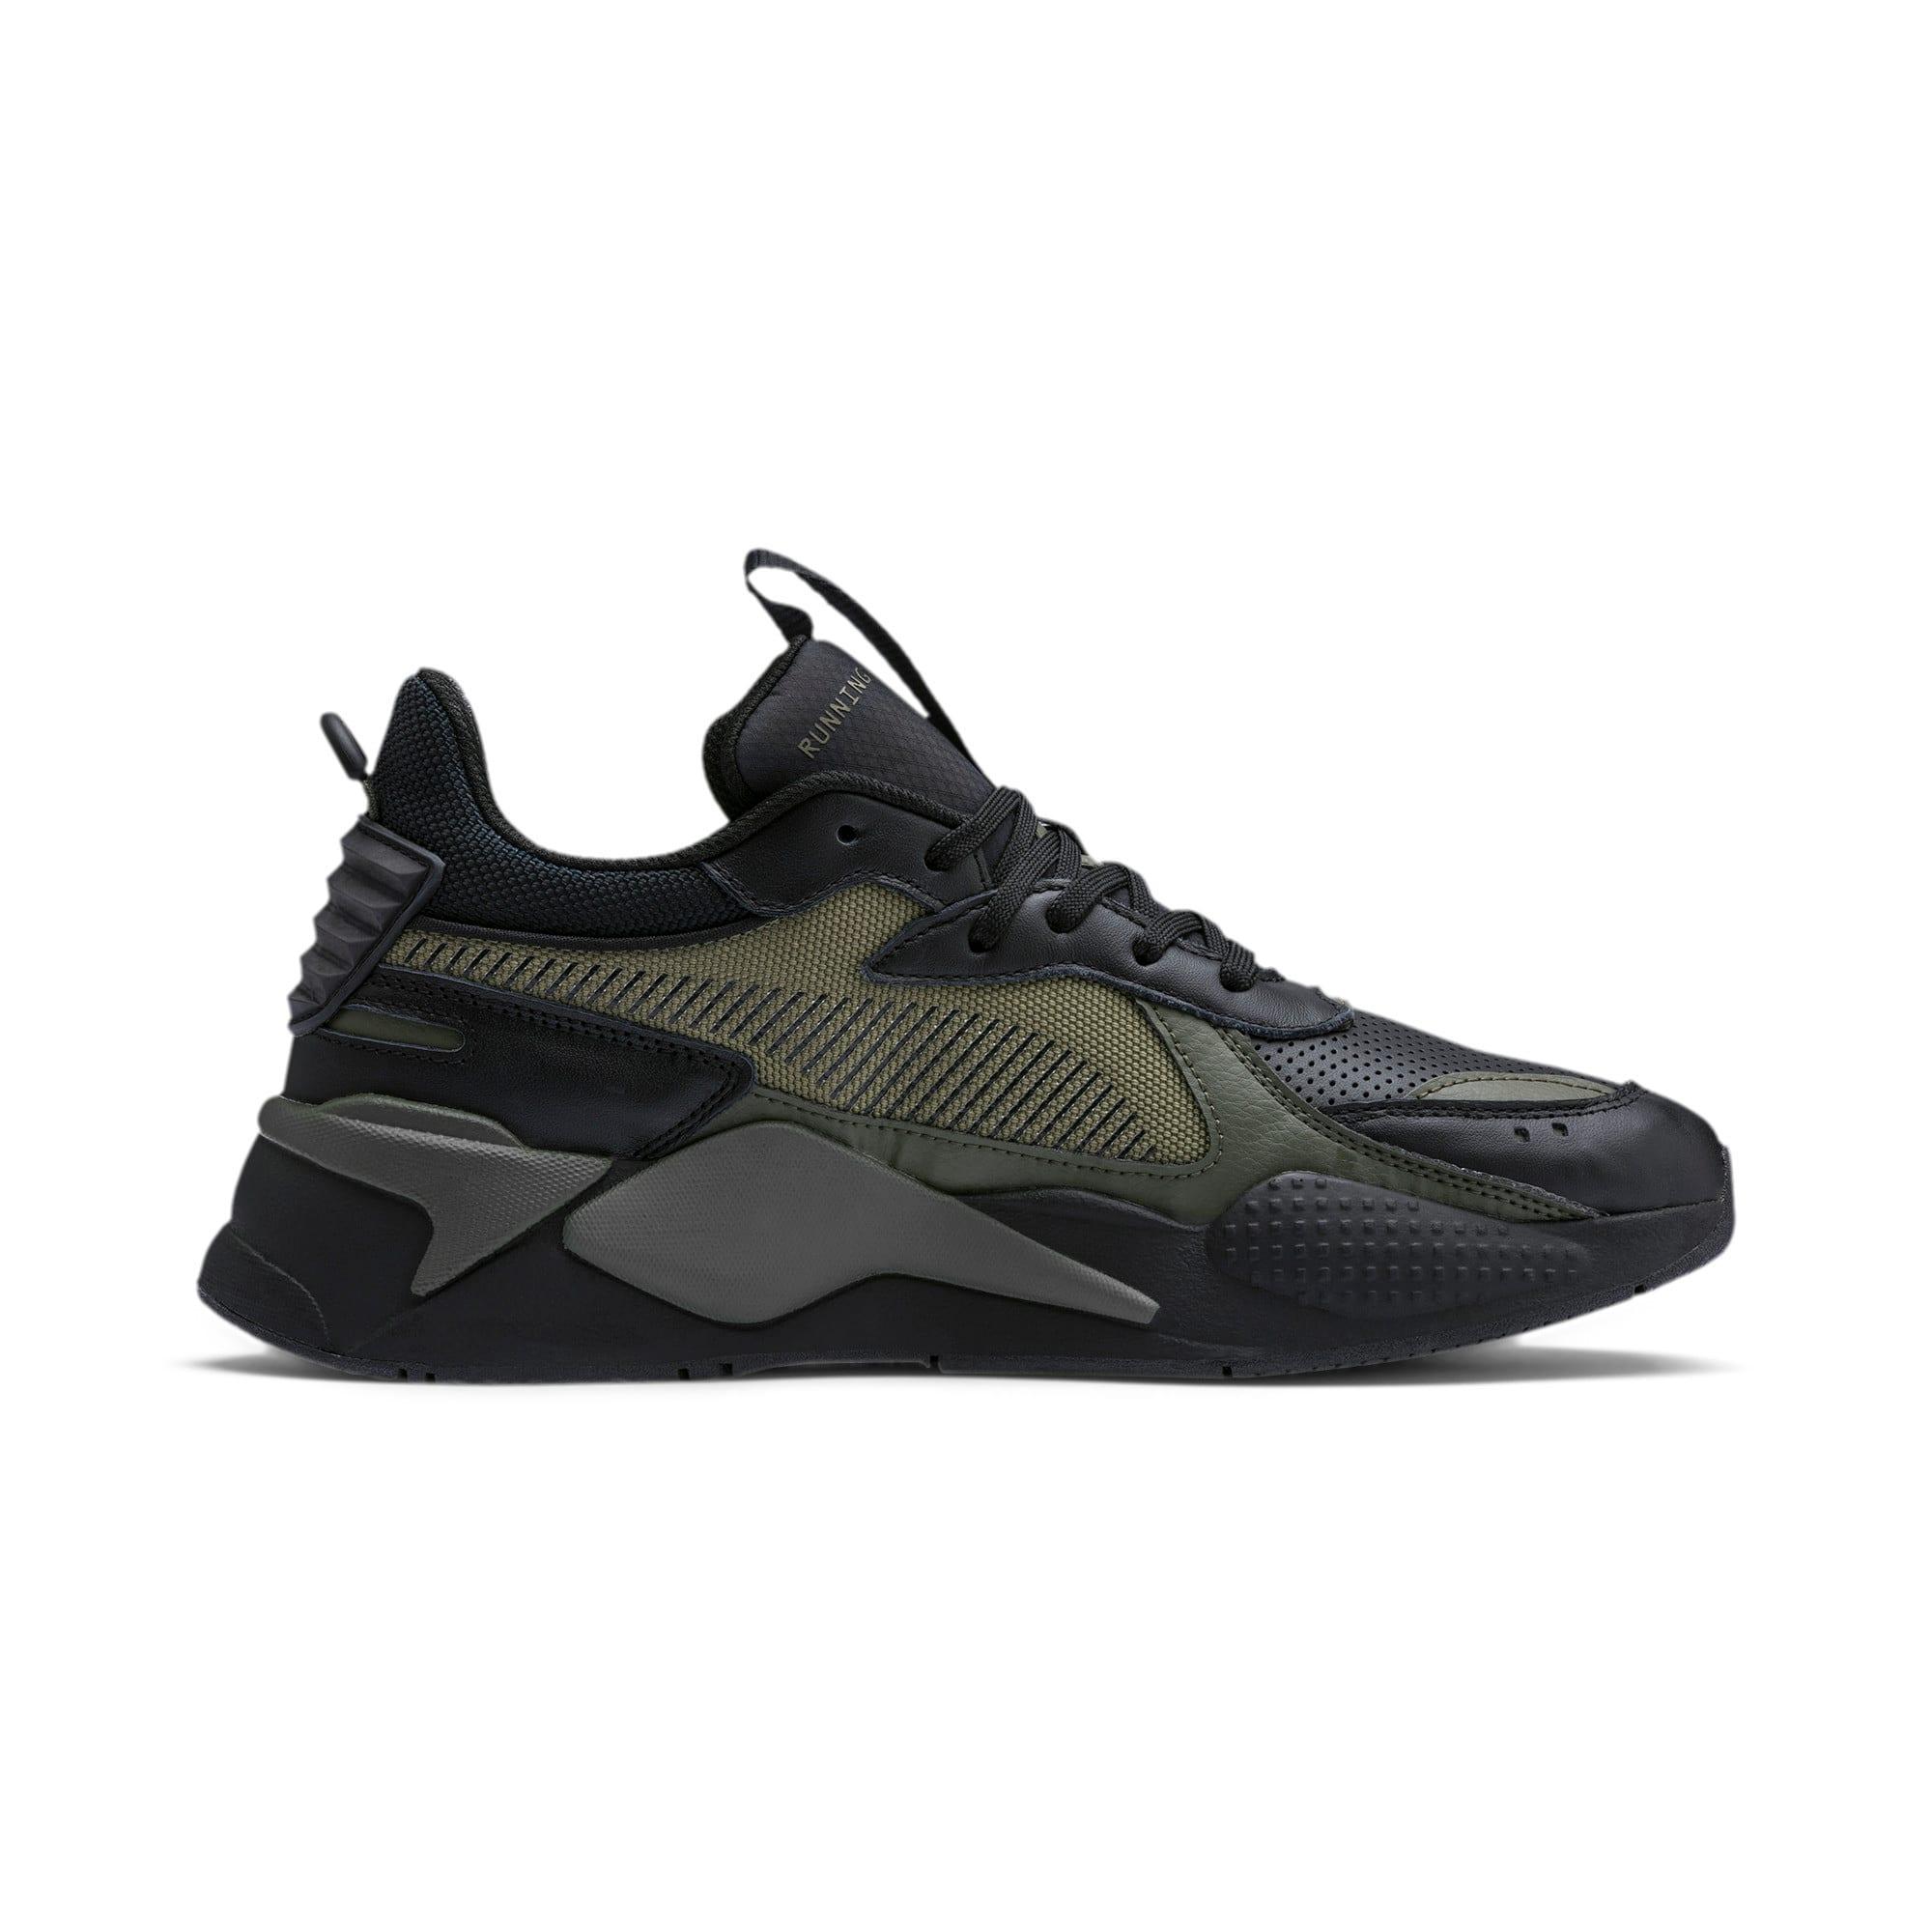 Thumbnail 7 of RS-X Winterized Sneakers, Puma Black-Burnt Olive, medium